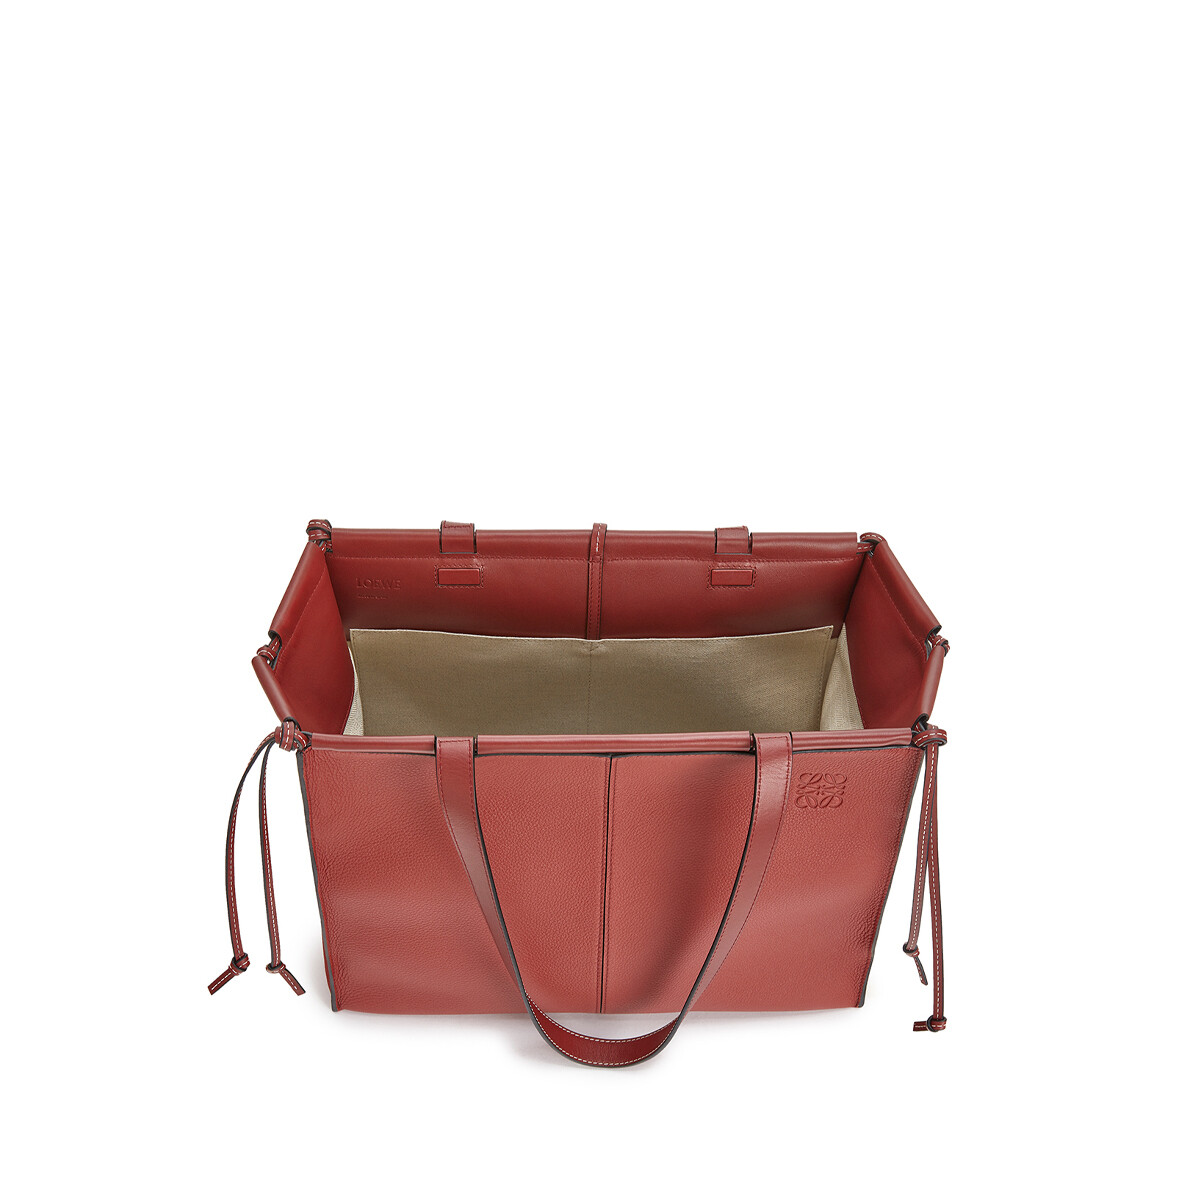 LOEWE Cushion Tote Garnet front